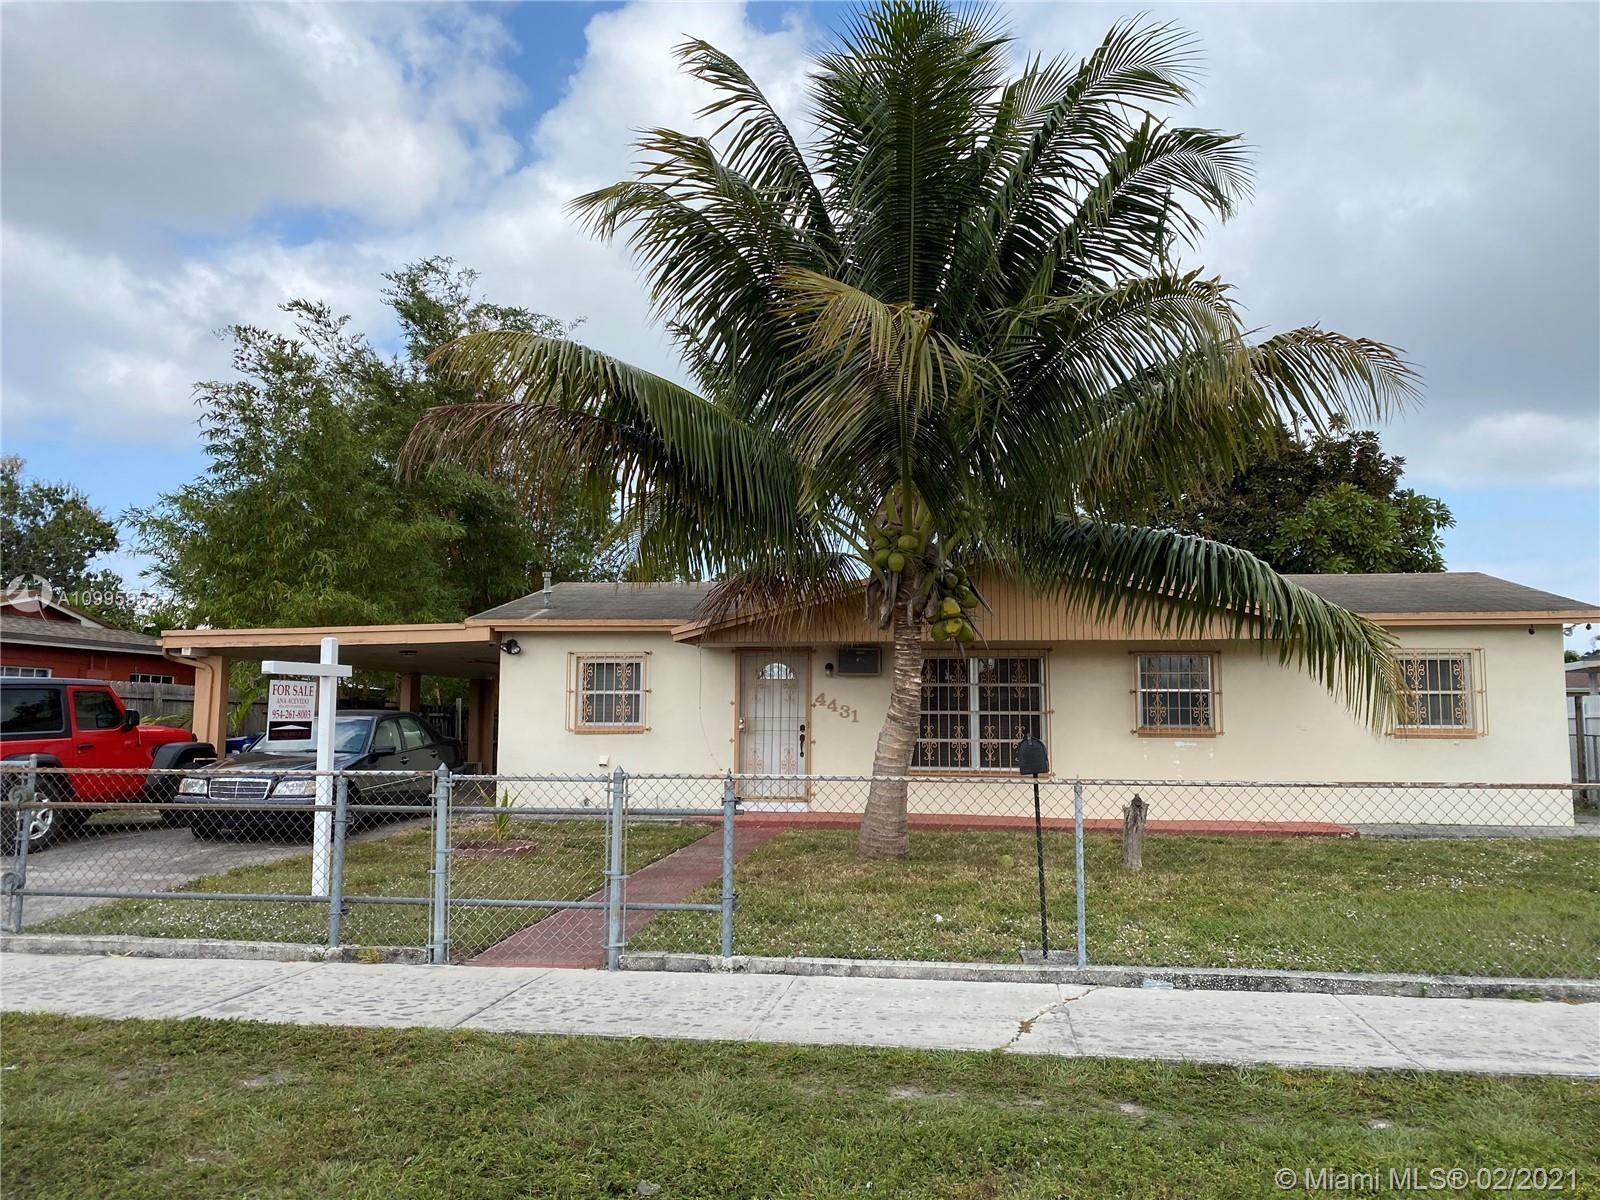 4431 NW 201st Ter, Miami Gardens, FL 33055 - #: A10995952